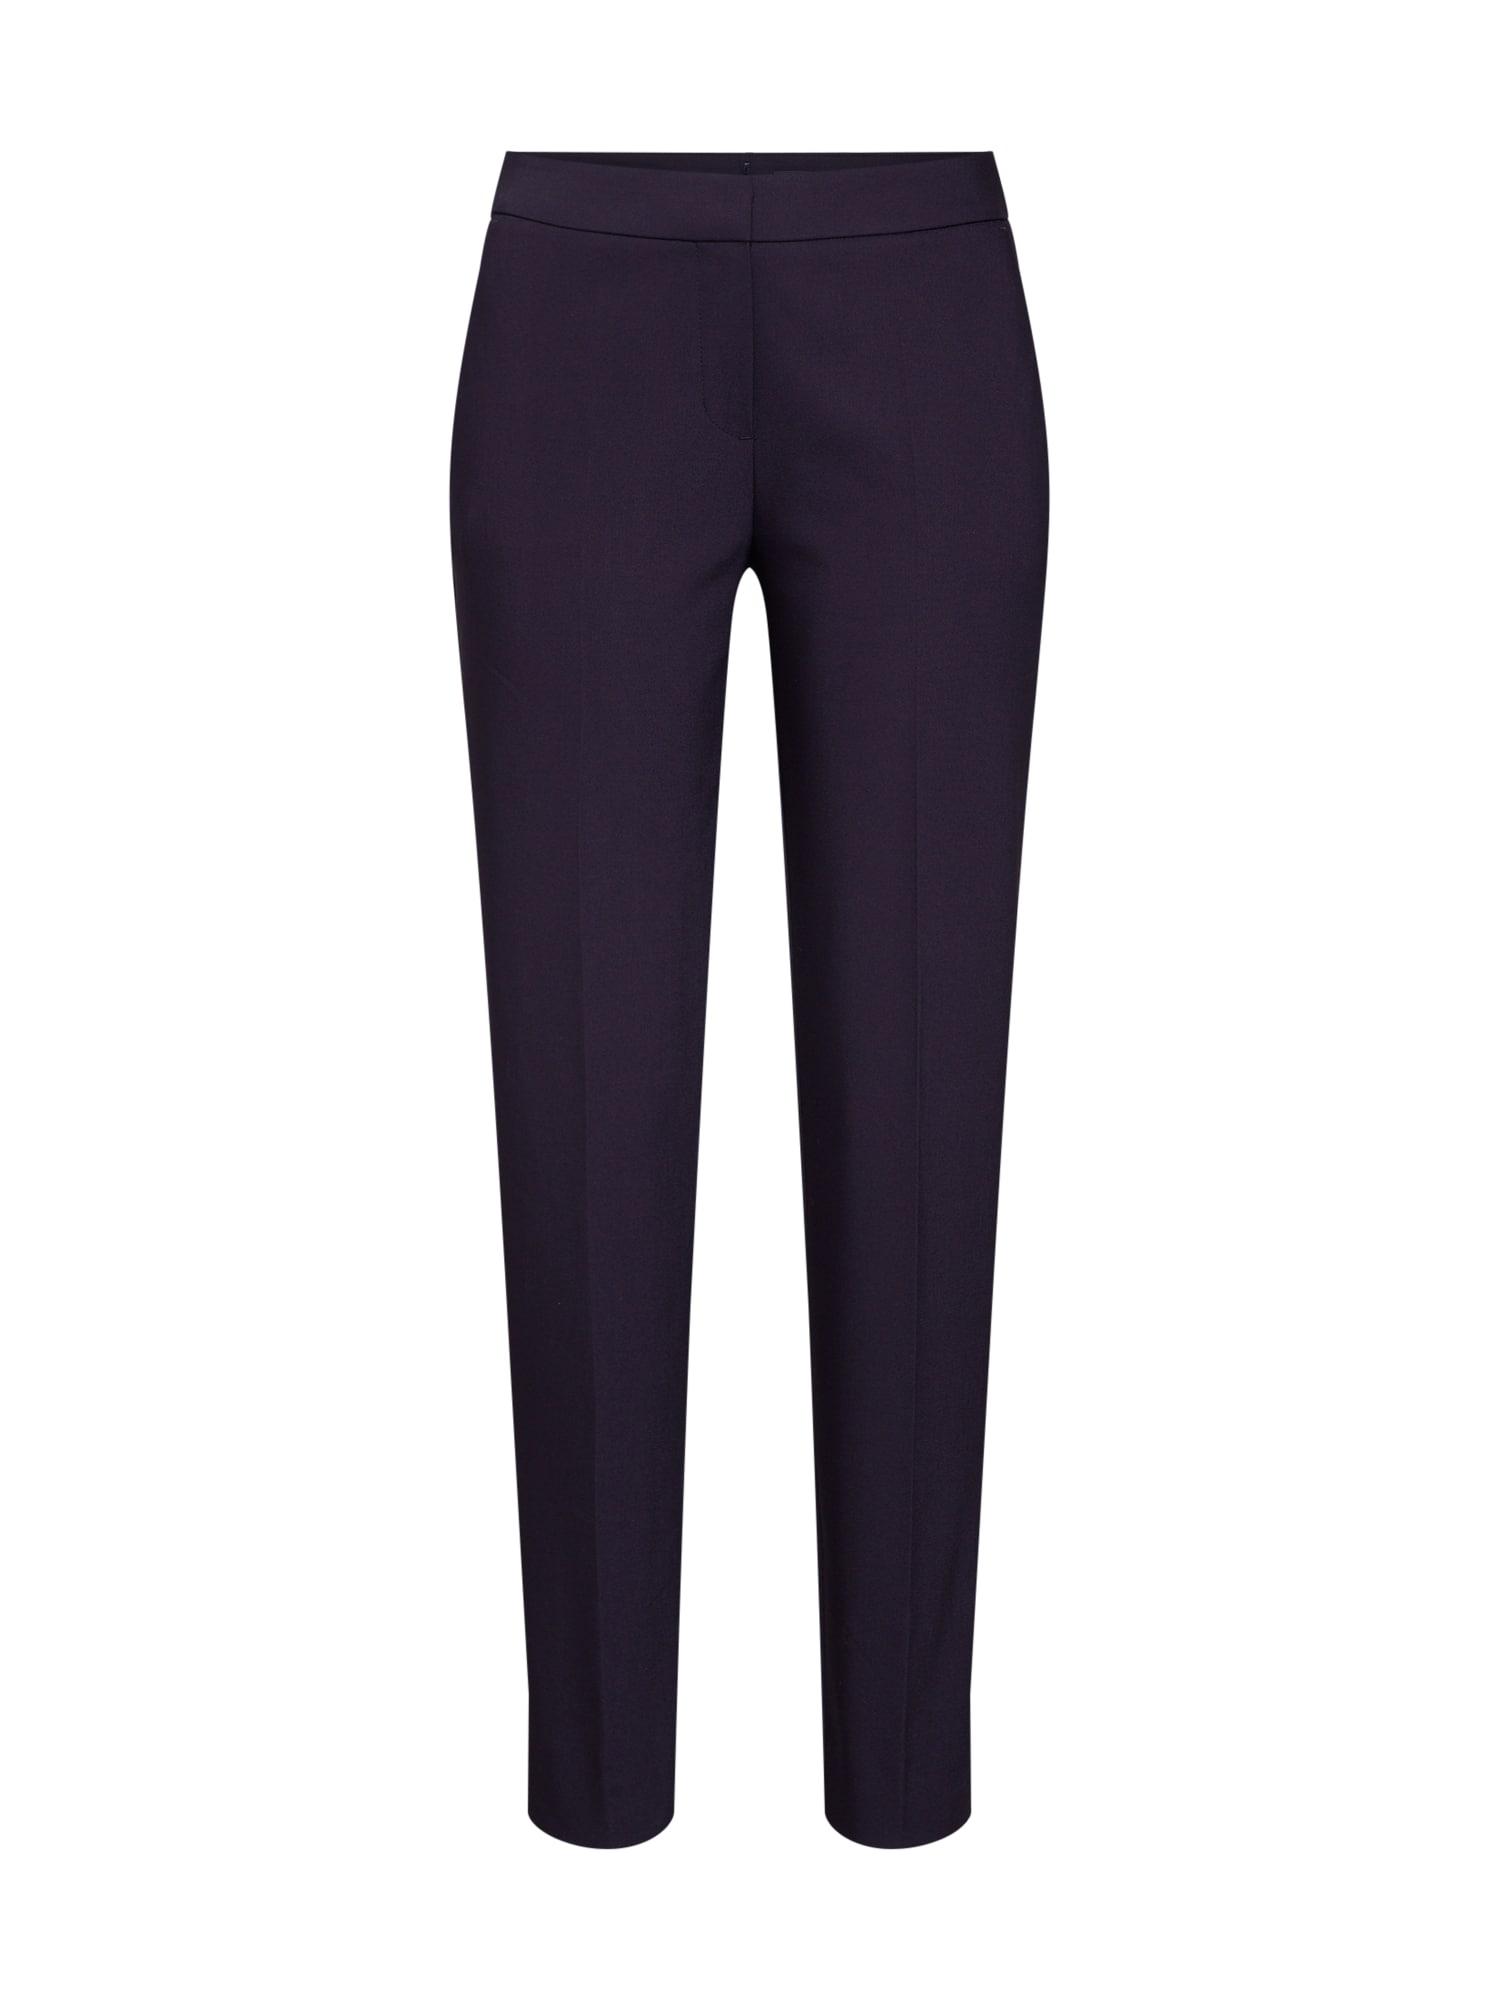 Kalhoty s puky marine modrá COMMA